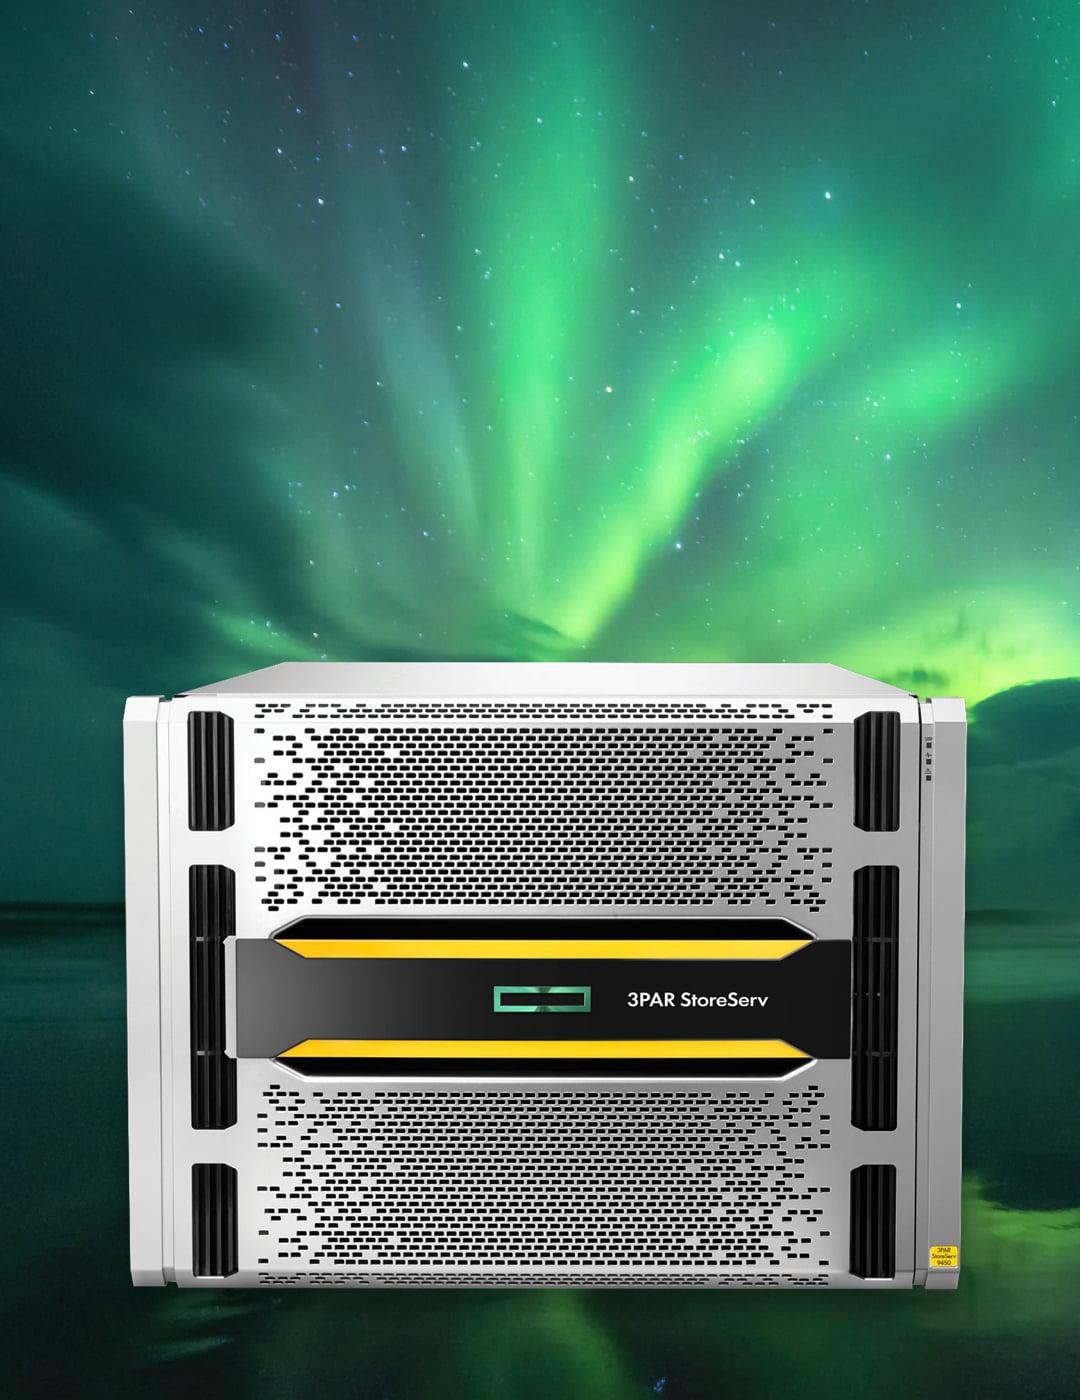 Kenza work launch of Hewlett-Packard Enterprise EMEA technology design data storage